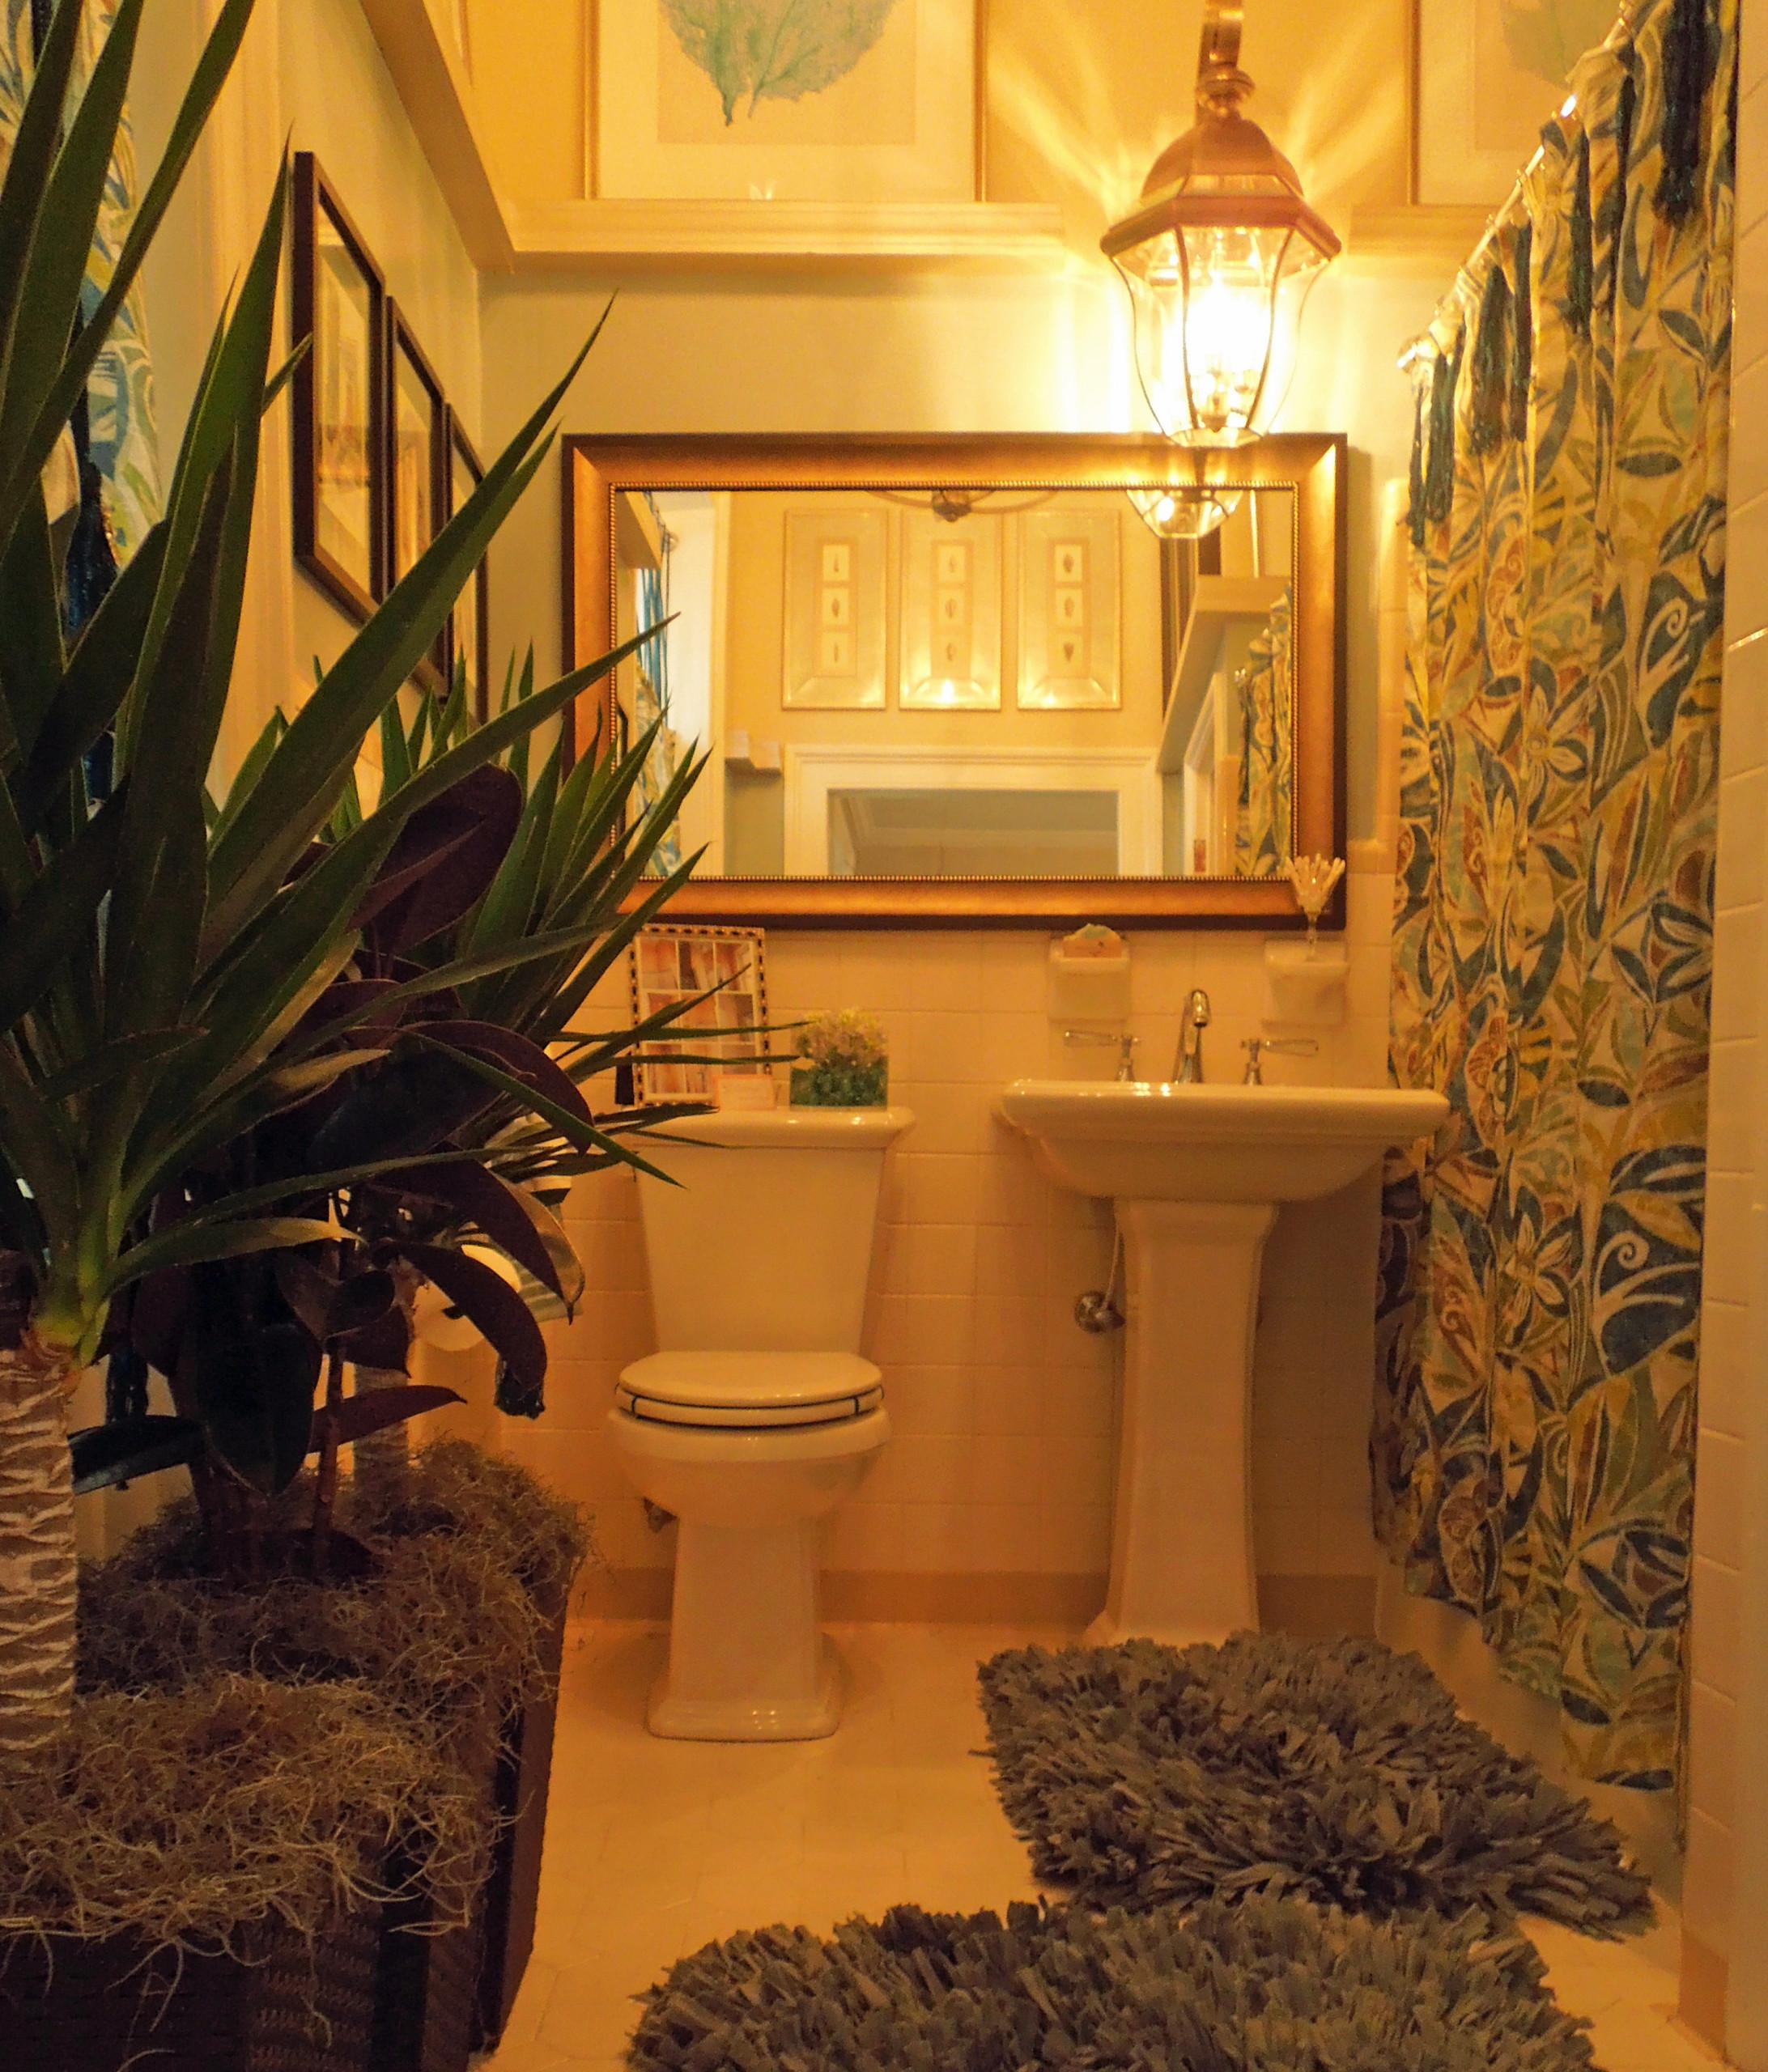 A bathroom for a bride